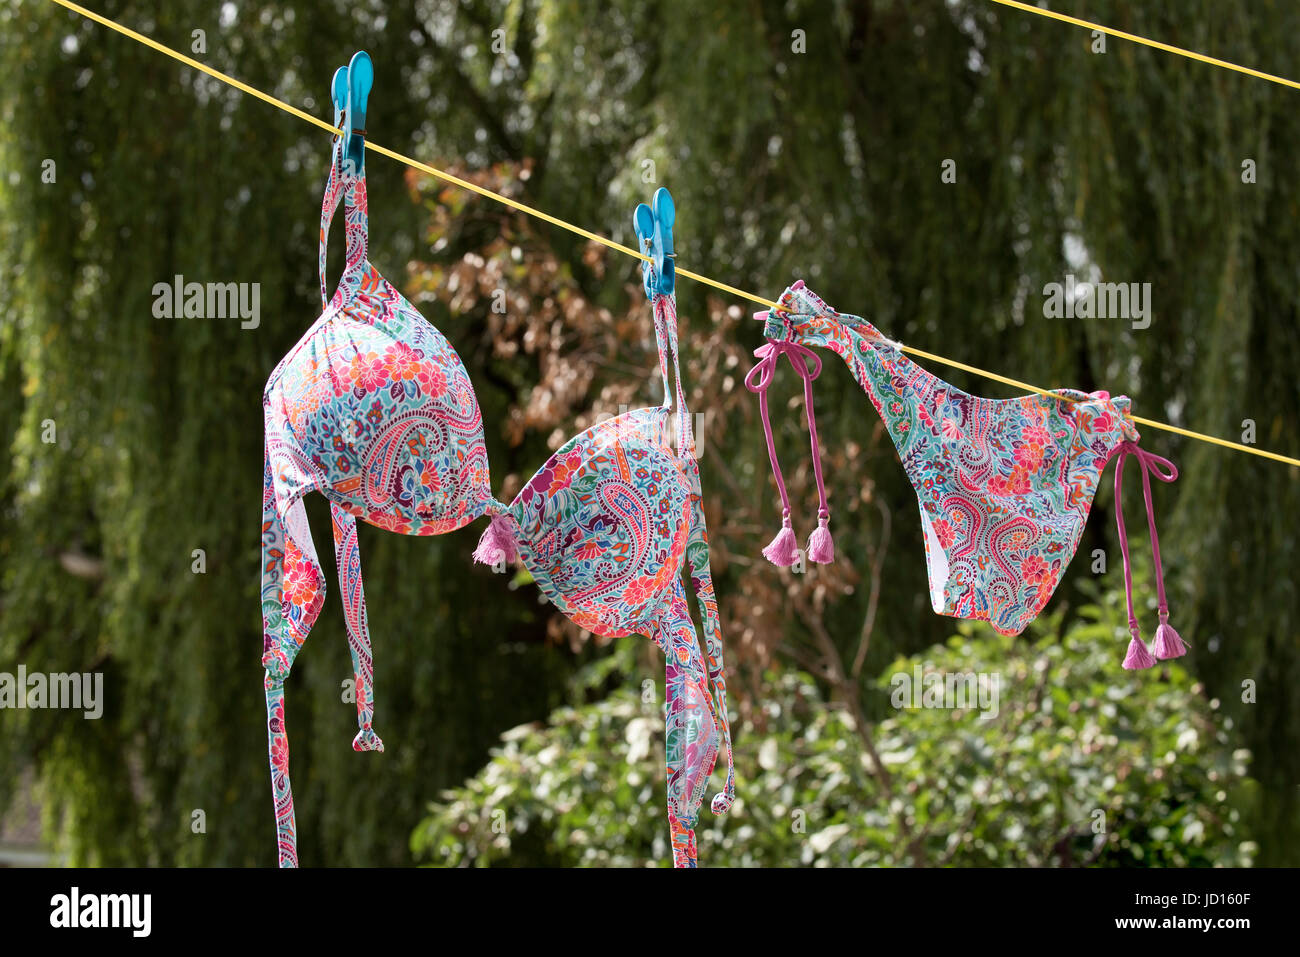 A colorful bikini hanging on a washing line - Stock Image